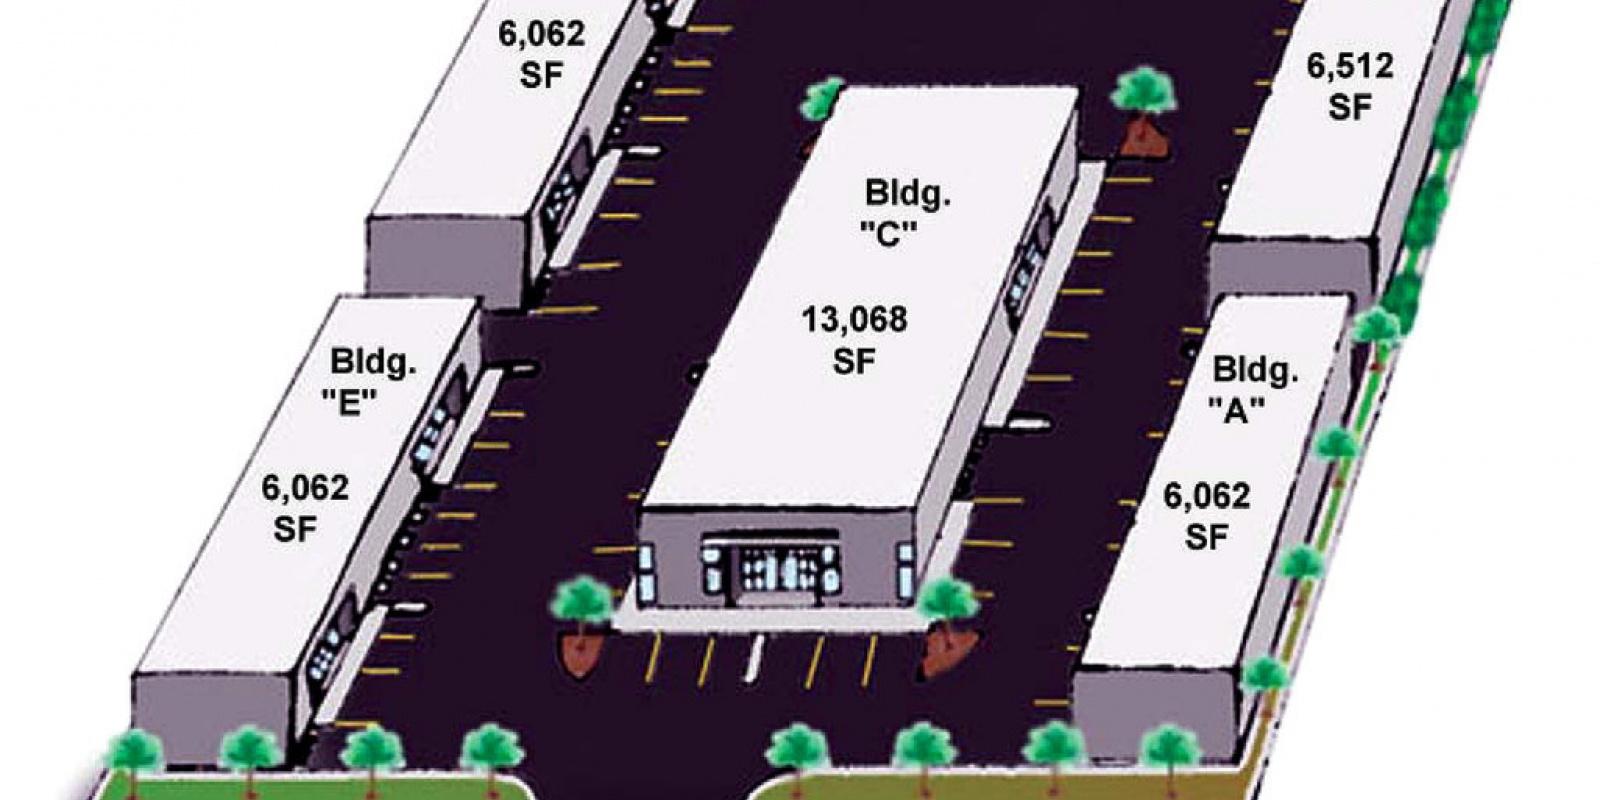 4707 NE Minnehaha St Blg D U 401 Vancouver, WA, ,Industrial,Sold/Leased,Minnehaha Business Plaza,4707 NE Minnehaha St Blg D U 401 Vancouver, WA,1467